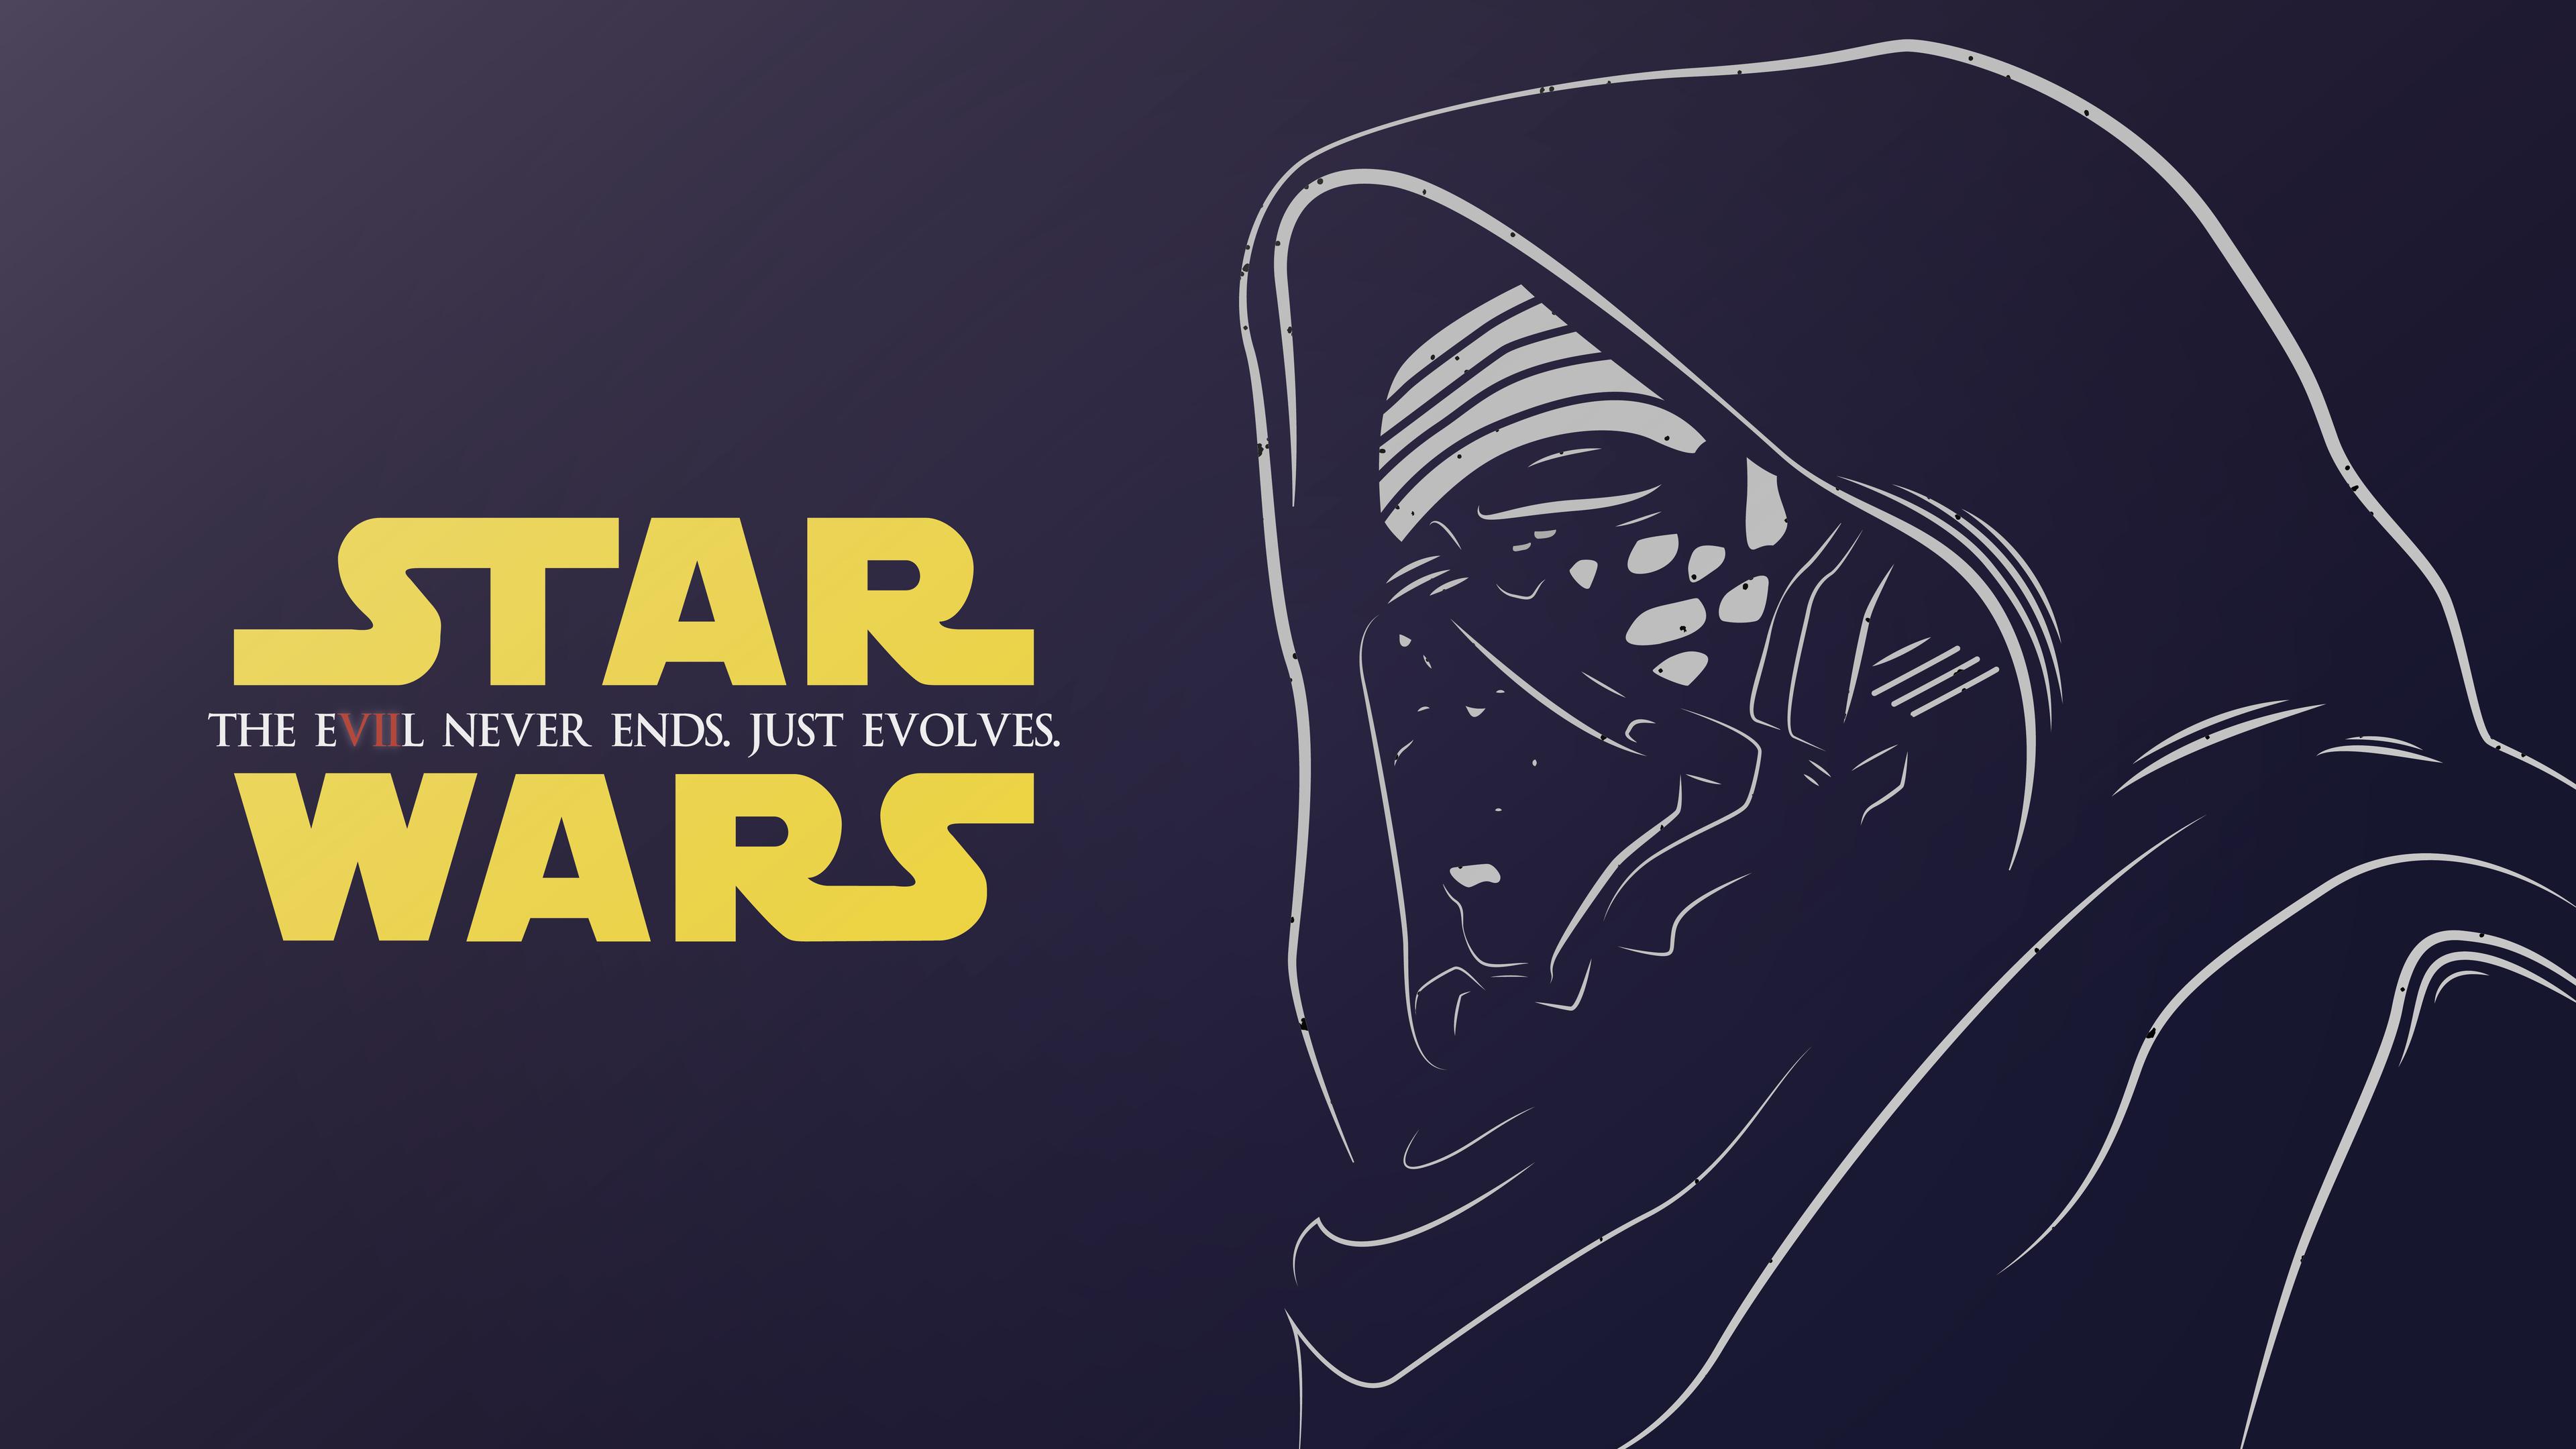 Wallpaper 4k Kylo Ren Star Wars Illustration 4k Wallpapers